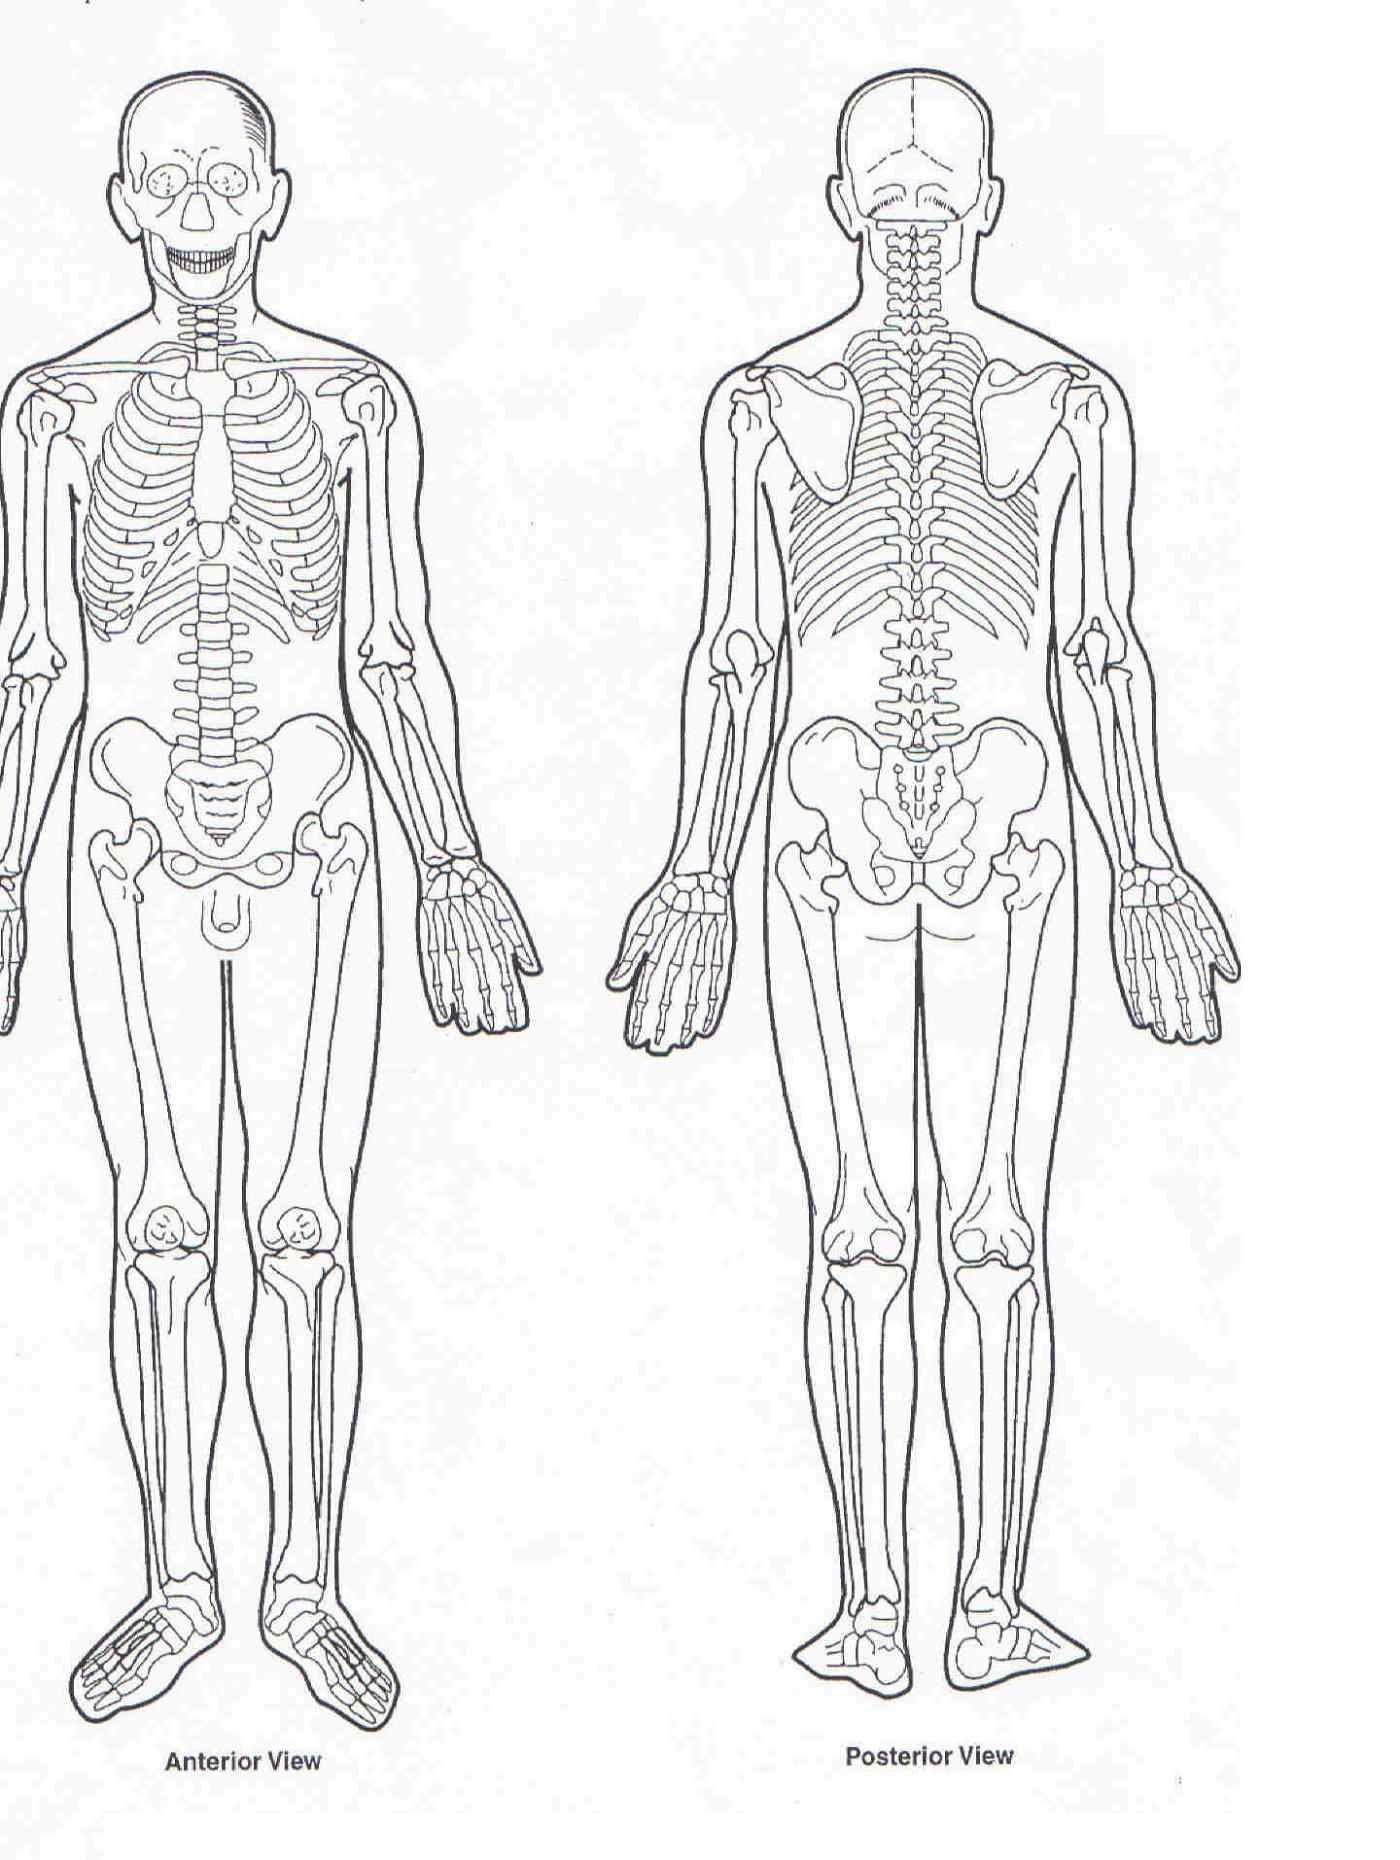 Human Muscles Diagram : human-leg-muscles-diagram